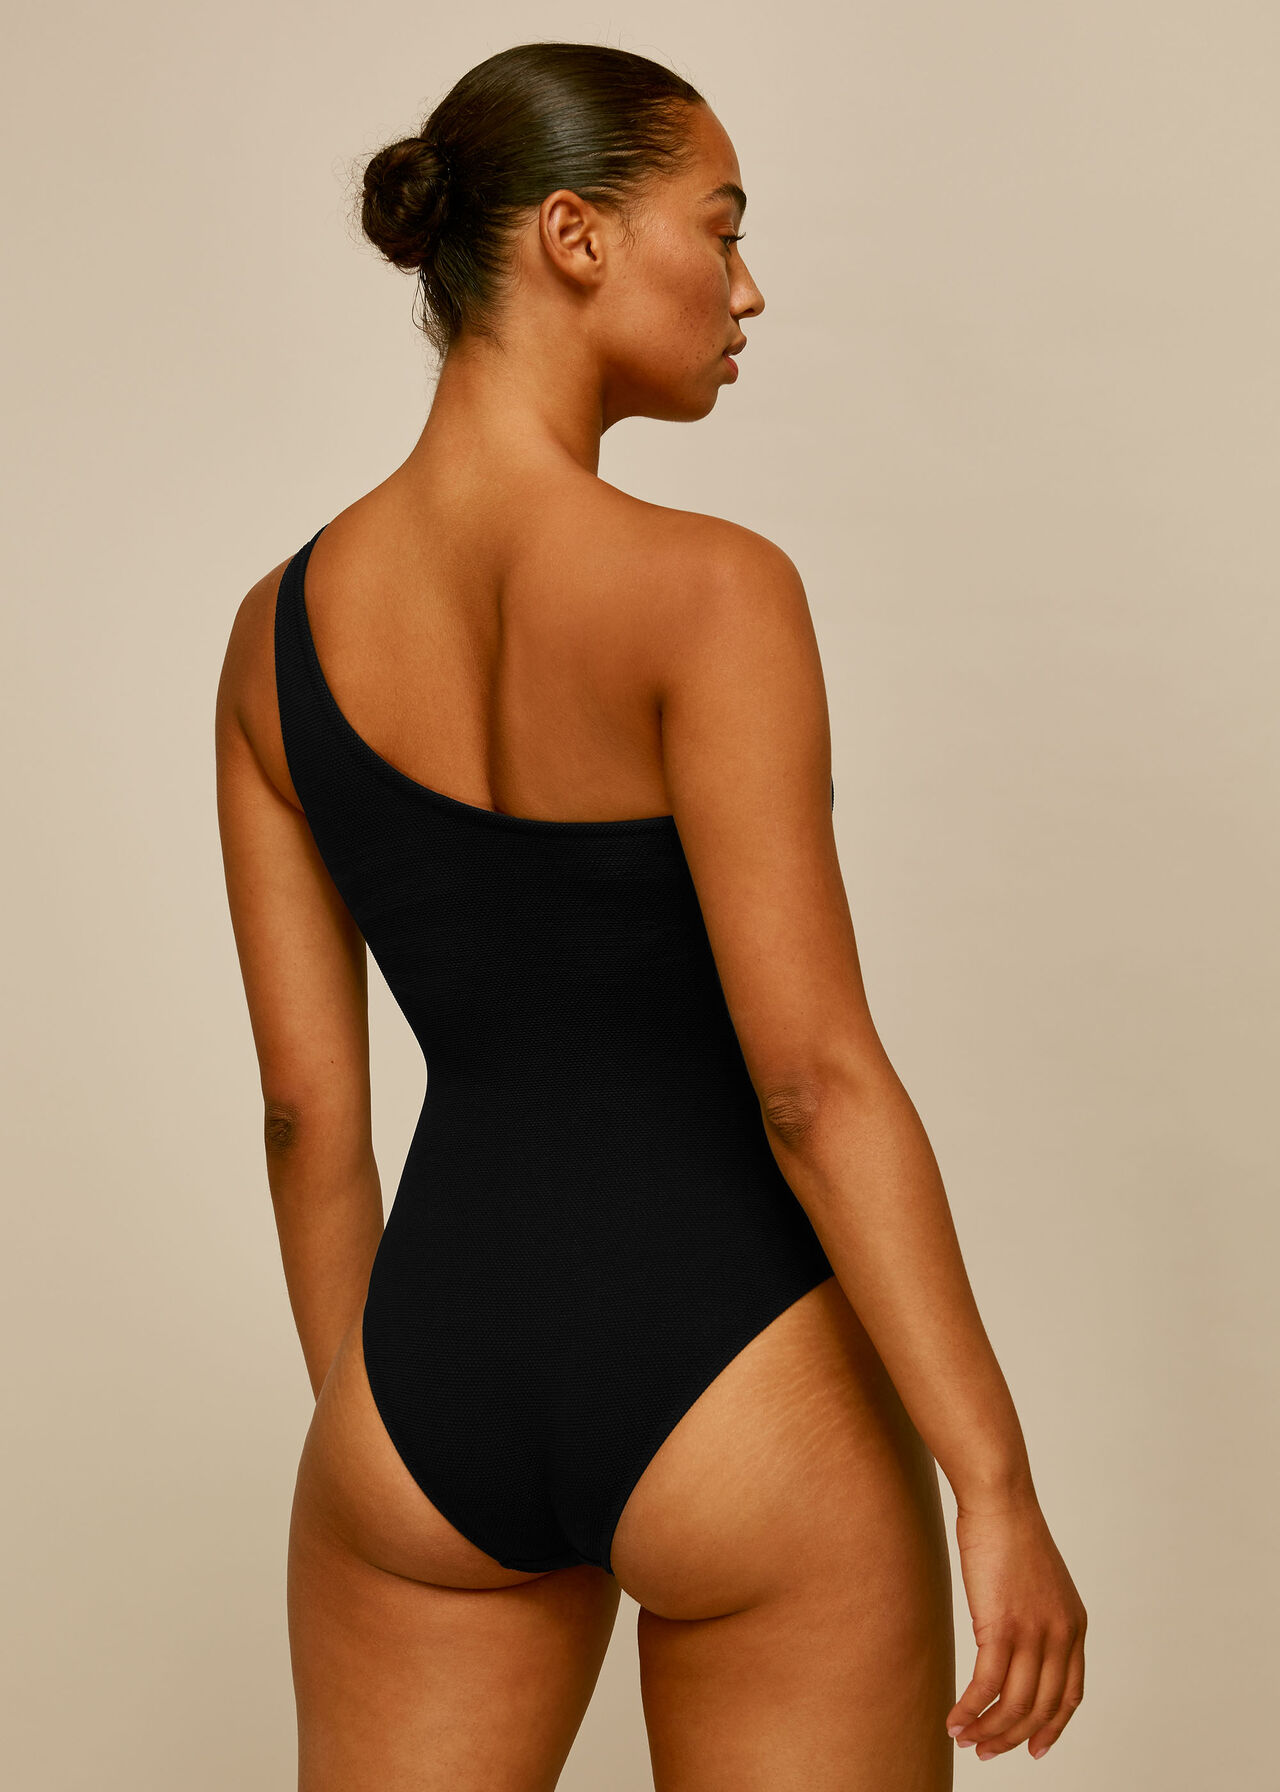 Tort Ring Textured Swimsuit Black